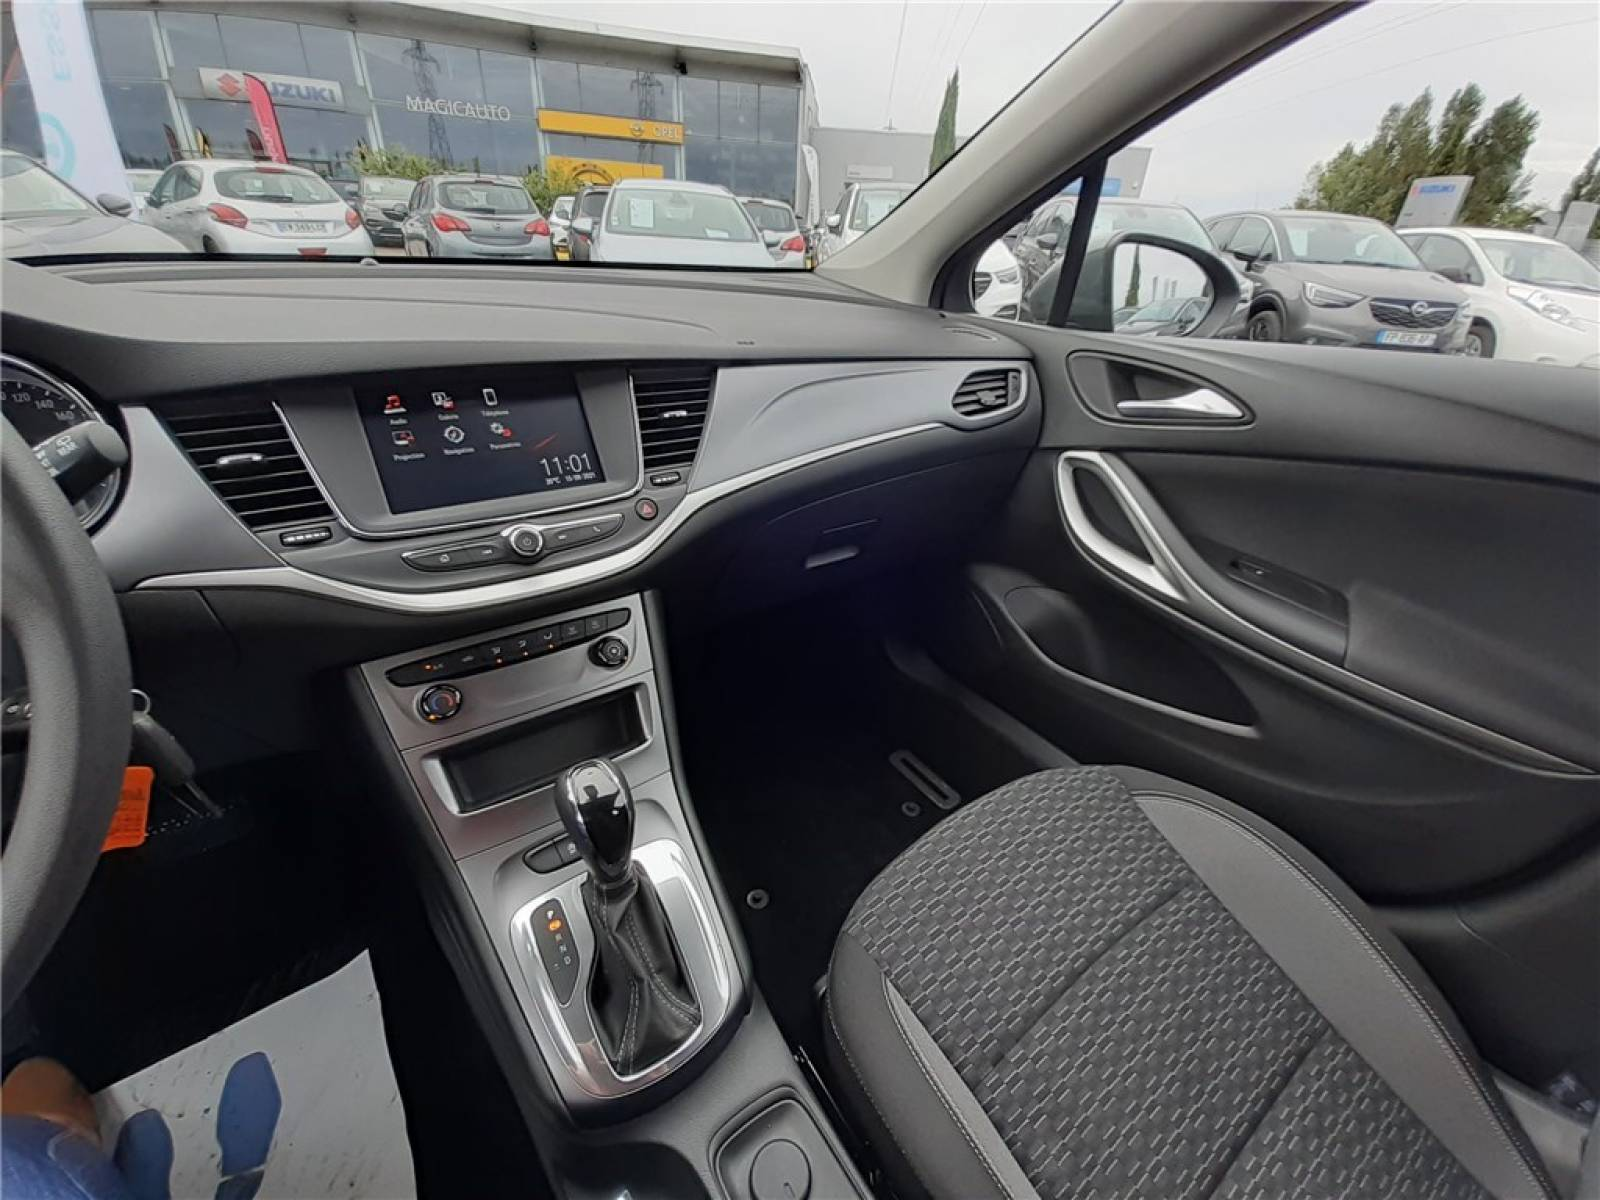 OPEL Astra Sports Tourer 1.5 Diesel 122 ch BVA9 - véhicule d'occasion - Groupe Guillet - Opel Magicauto - Chalon-sur-Saône - 71380 - Saint-Marcel - 41